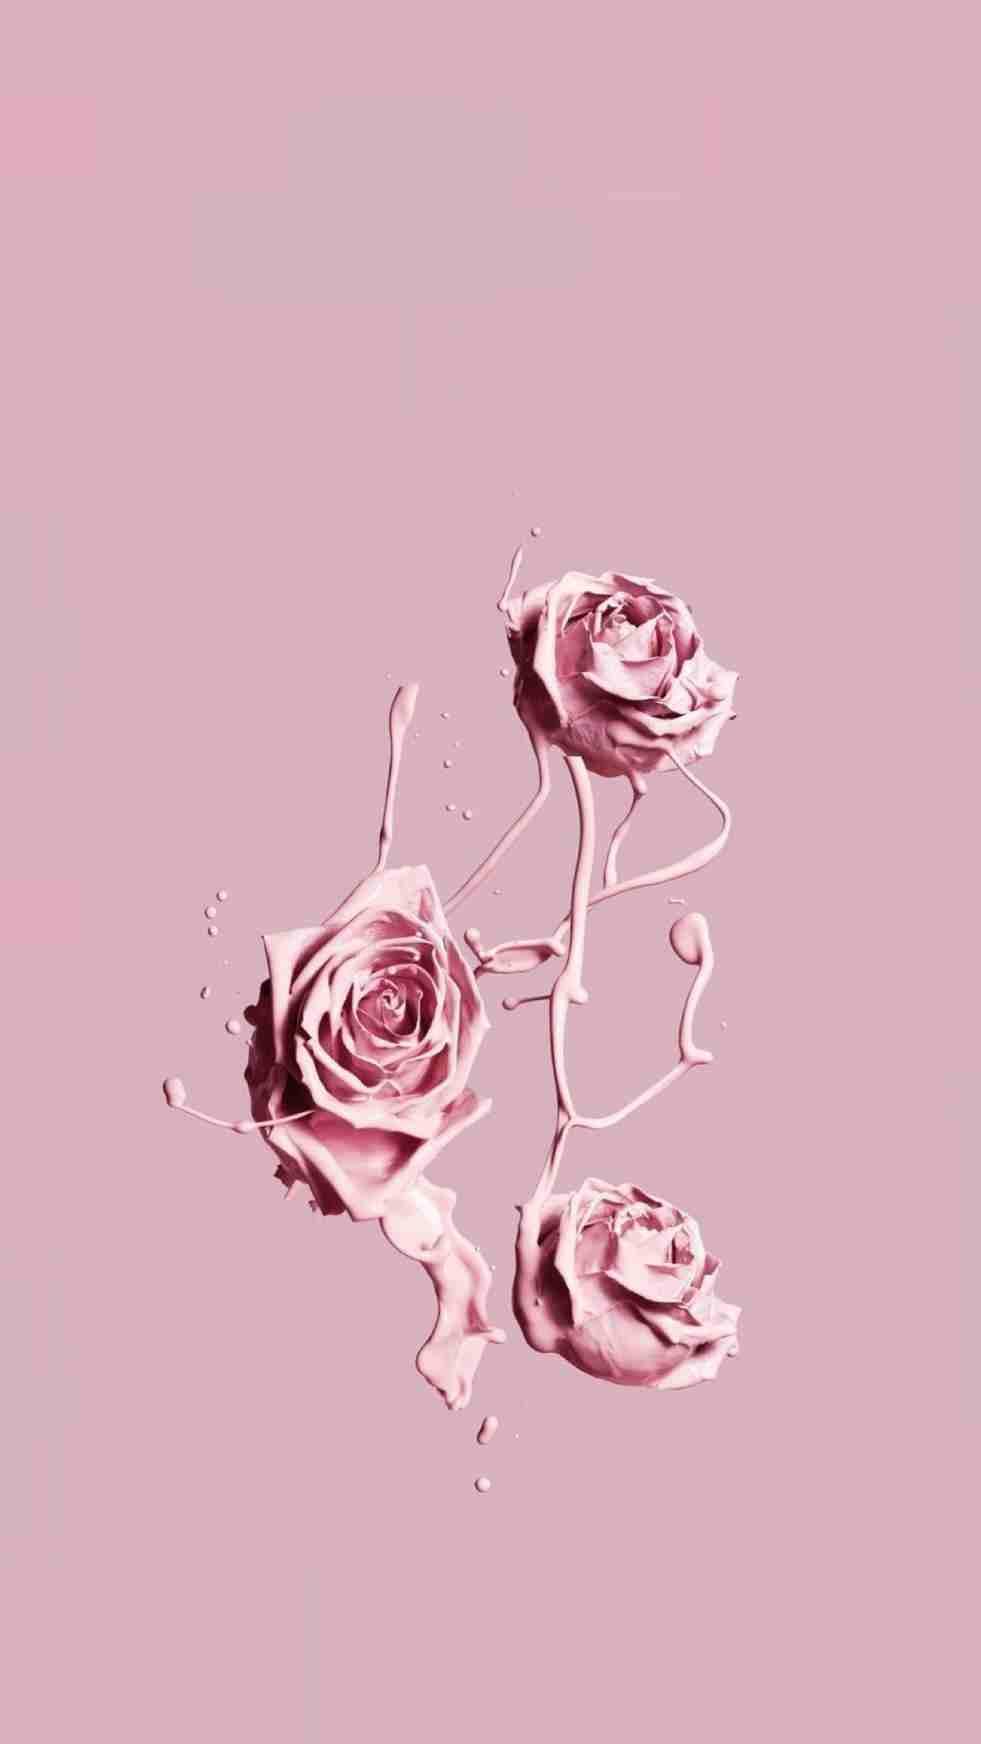 Rose Aesthetic Wallpapers Wallpaper Cave